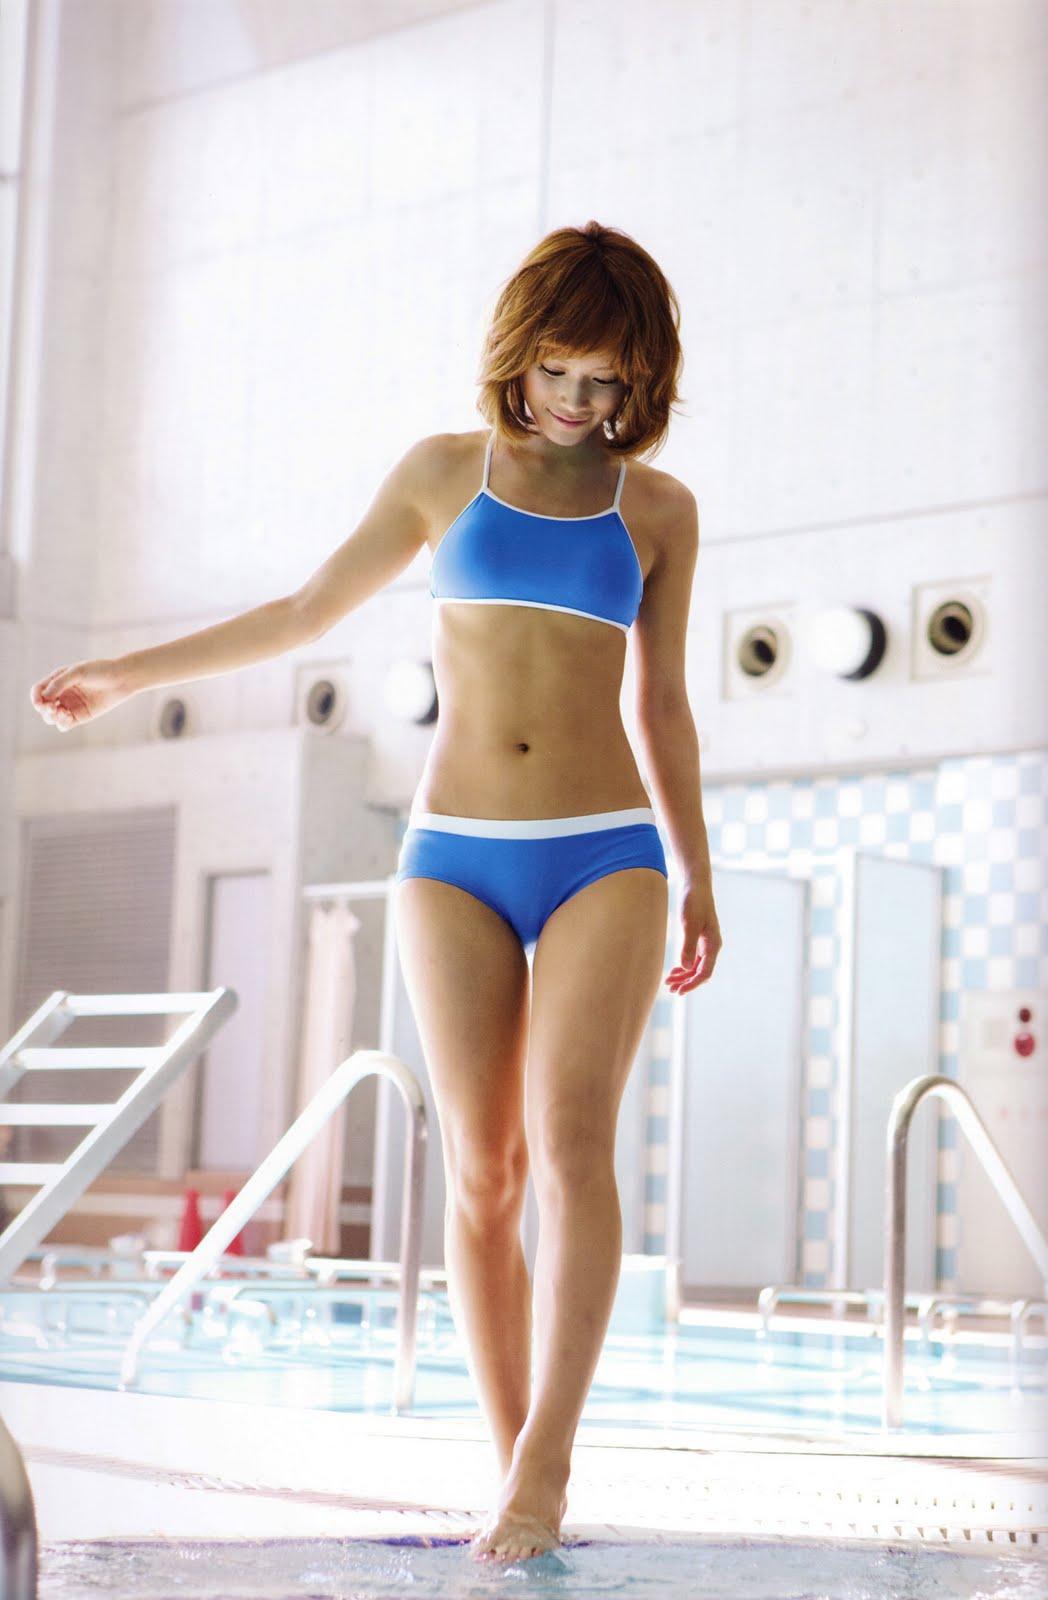 http://4.bp.blogspot.com/_hJVox6-vy_4/TR6ntM4XEGI/AAAAAAAADn0/kpHX7Qg3oD4/s1600/Kamei%2BEri%2Bin%2Bgym%2Band%2Bswimming%2Bpool06.jpg